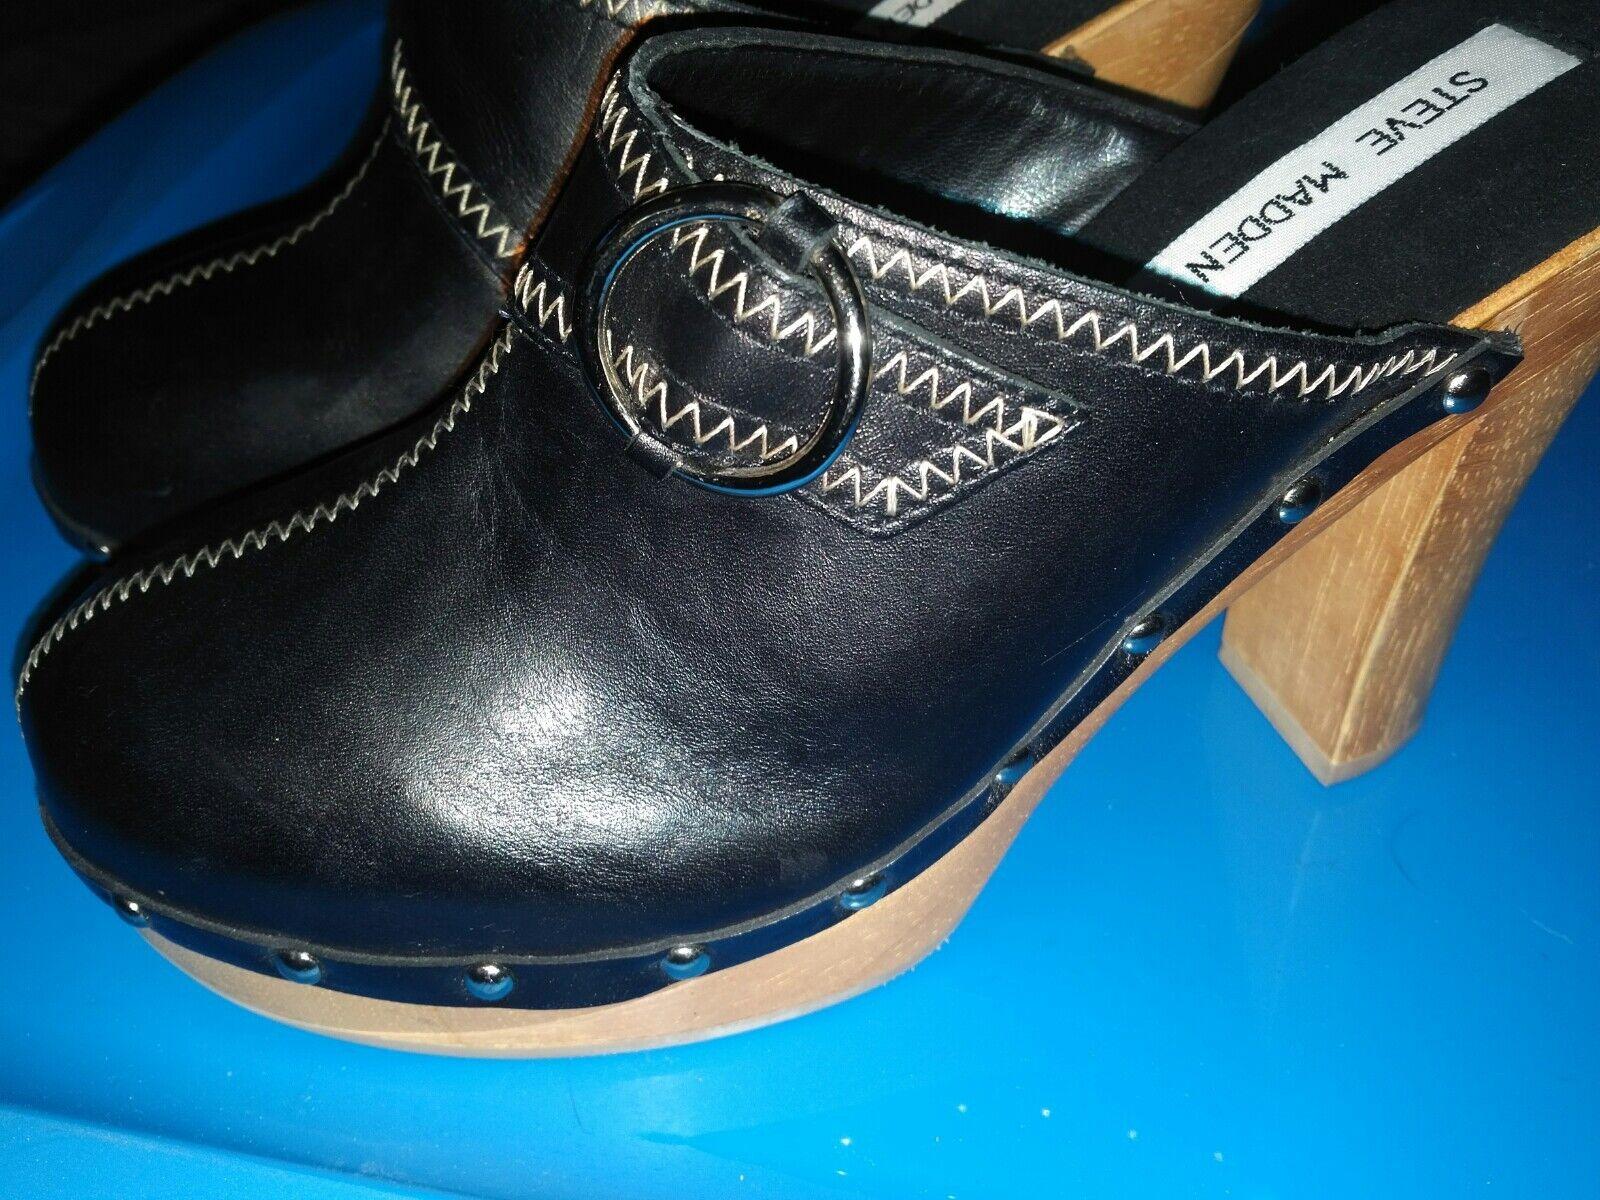 Steve Madden Size 7 B Faris Faris Faris Black Leather Slip on Clog Wooden Heel wood platform 22e28d